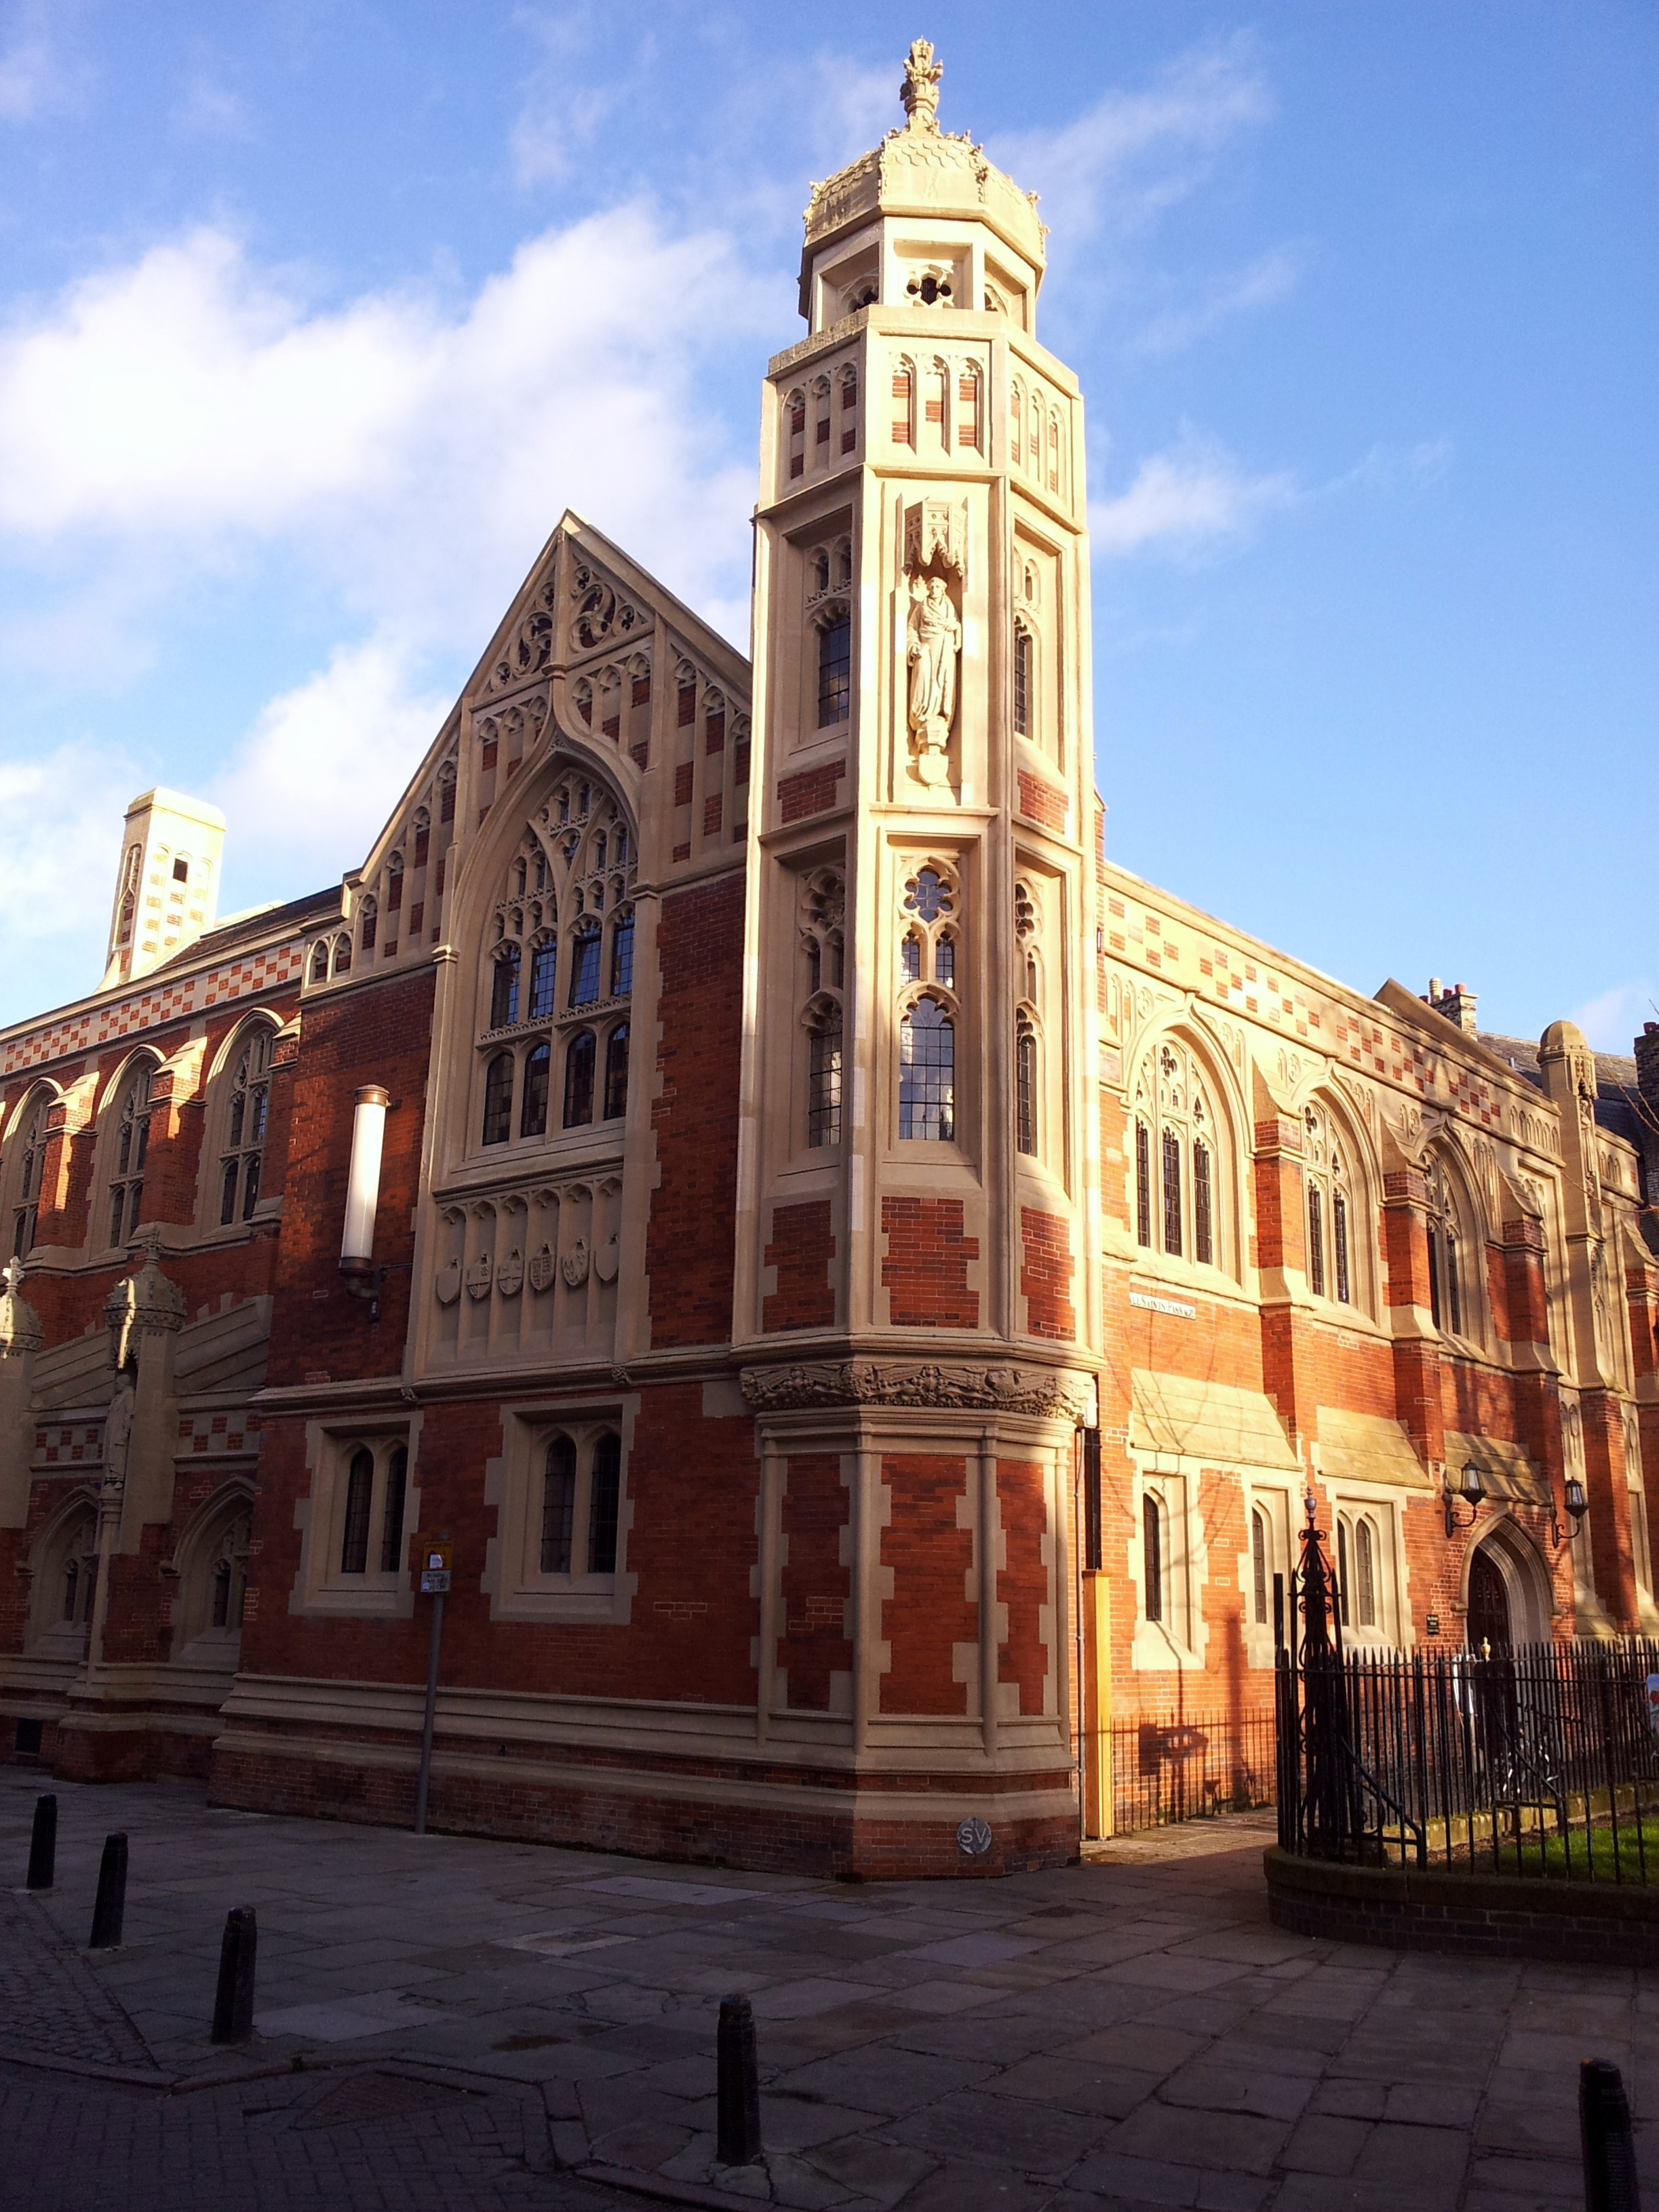 Old Divinity School, St John's College, Cambridge